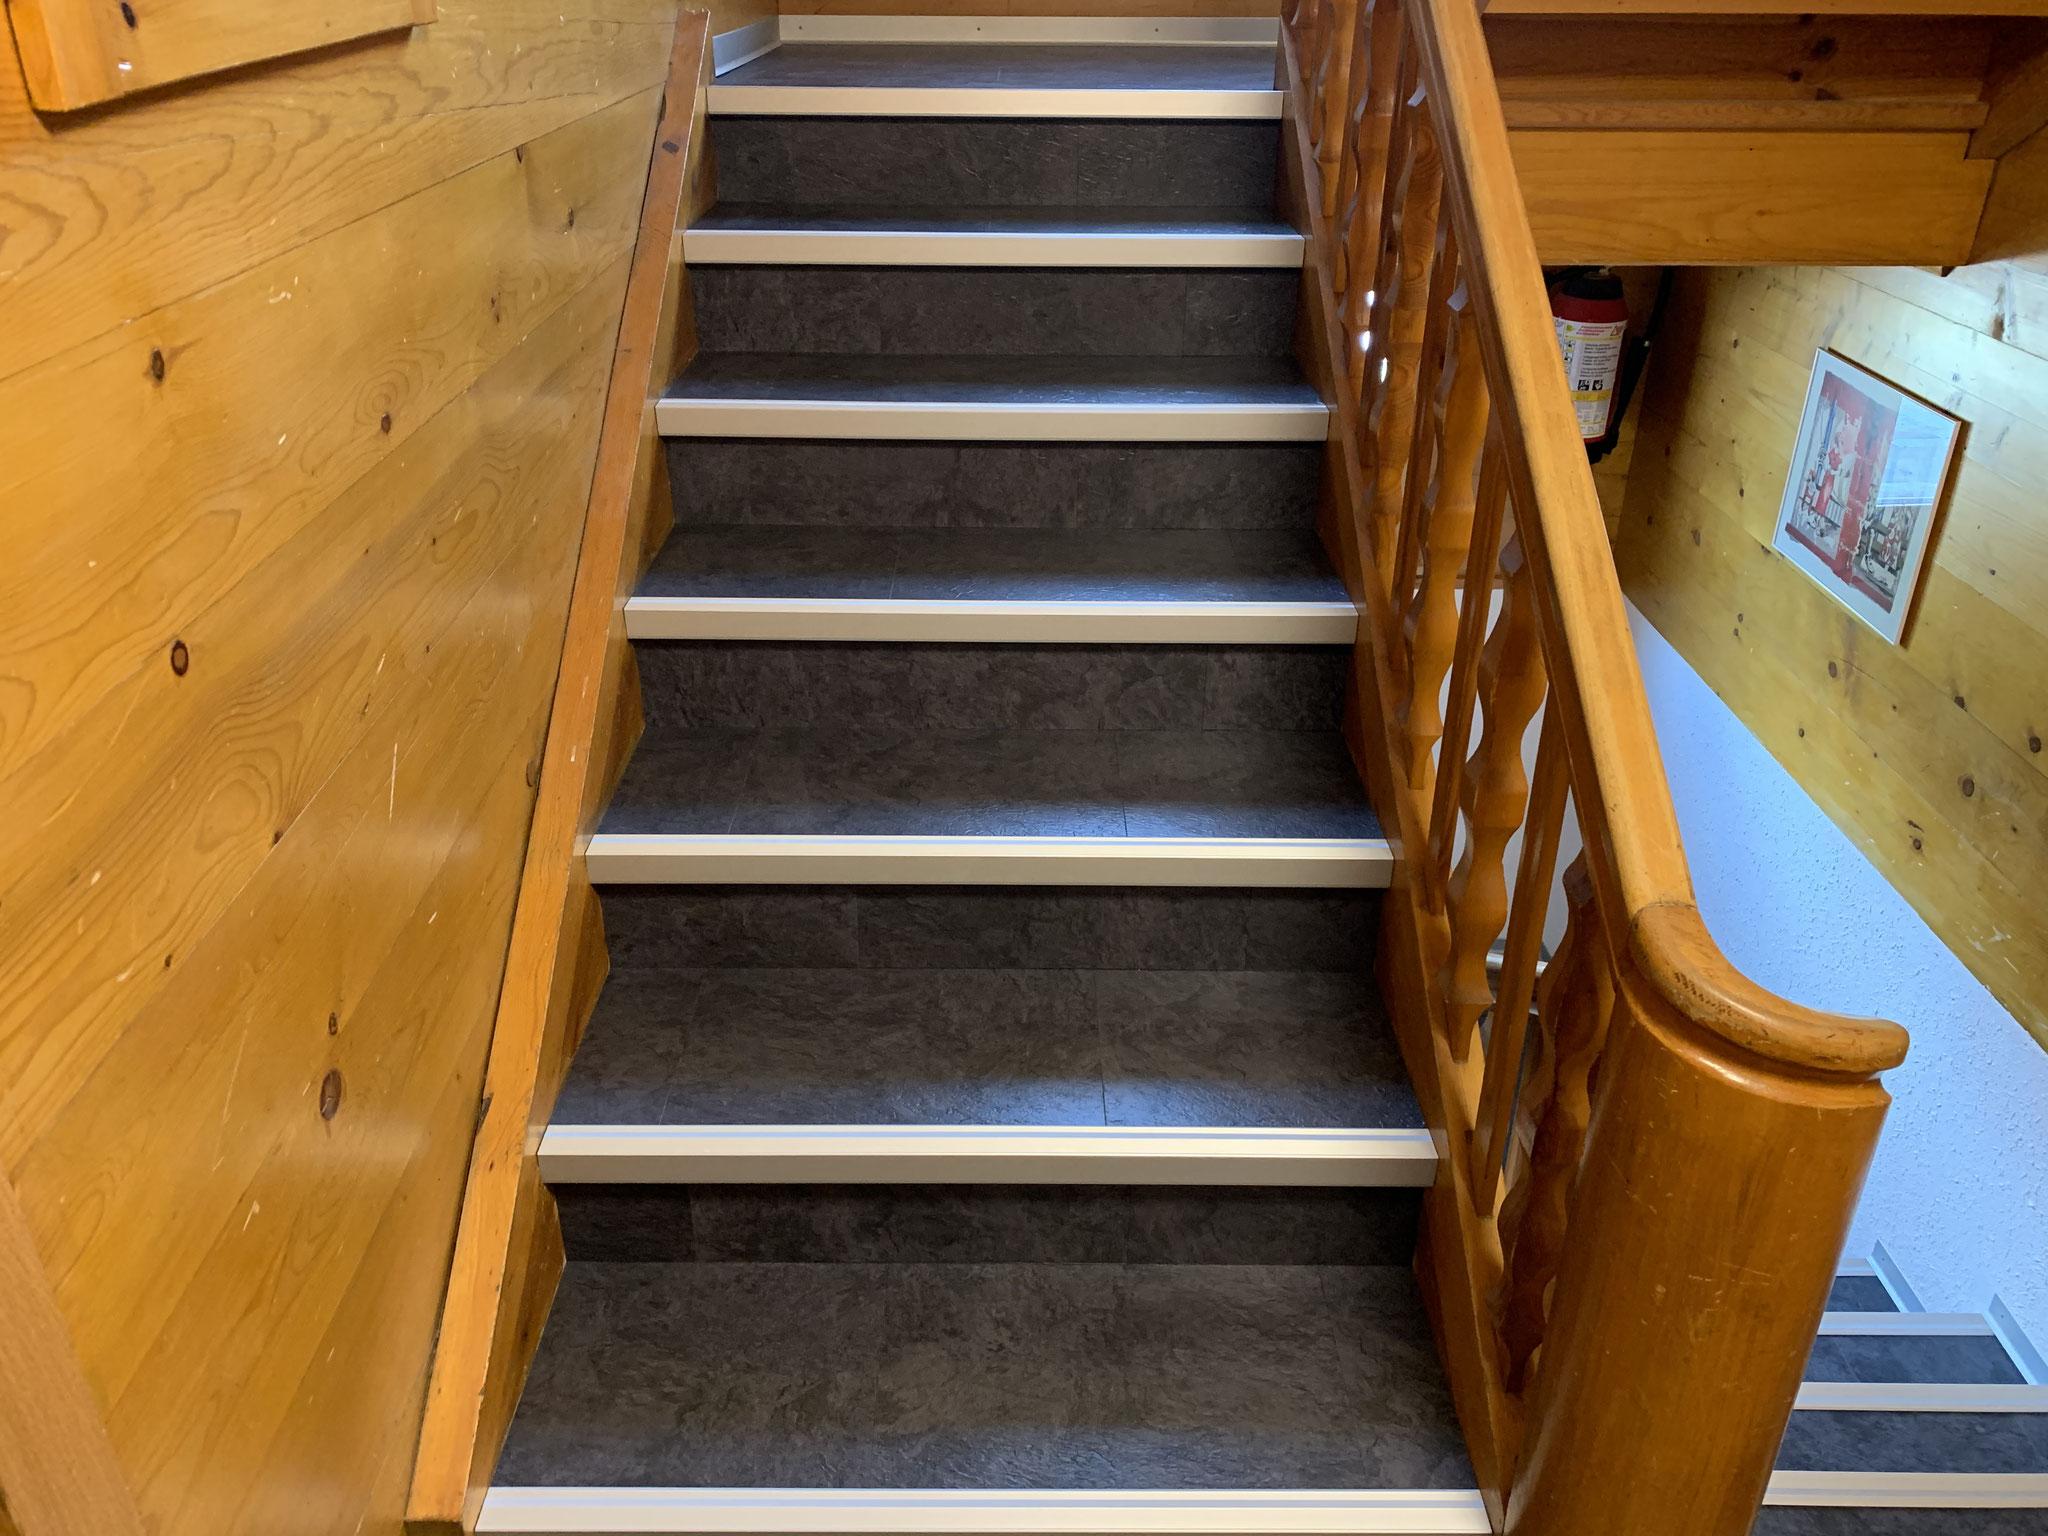 ... Treppe mit Designbelag